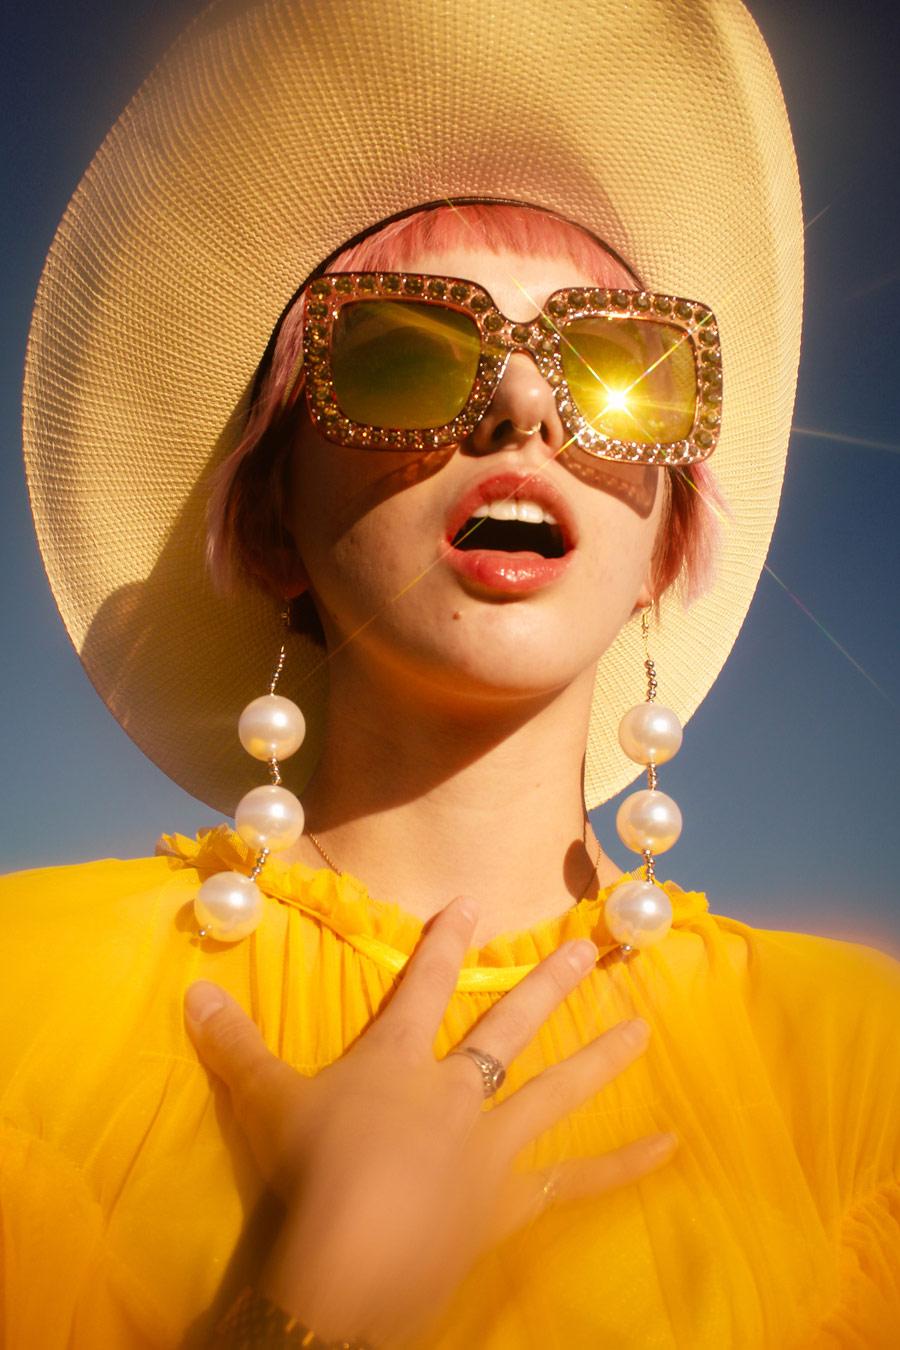 Выпускной вечер 80-х в космосе, © Дани Беннетт, Кейв Крик, США, Финалист категории «Дебют / Студент», «Взгляд» — фотоконкурс на тему «Мода» | PDN The Look